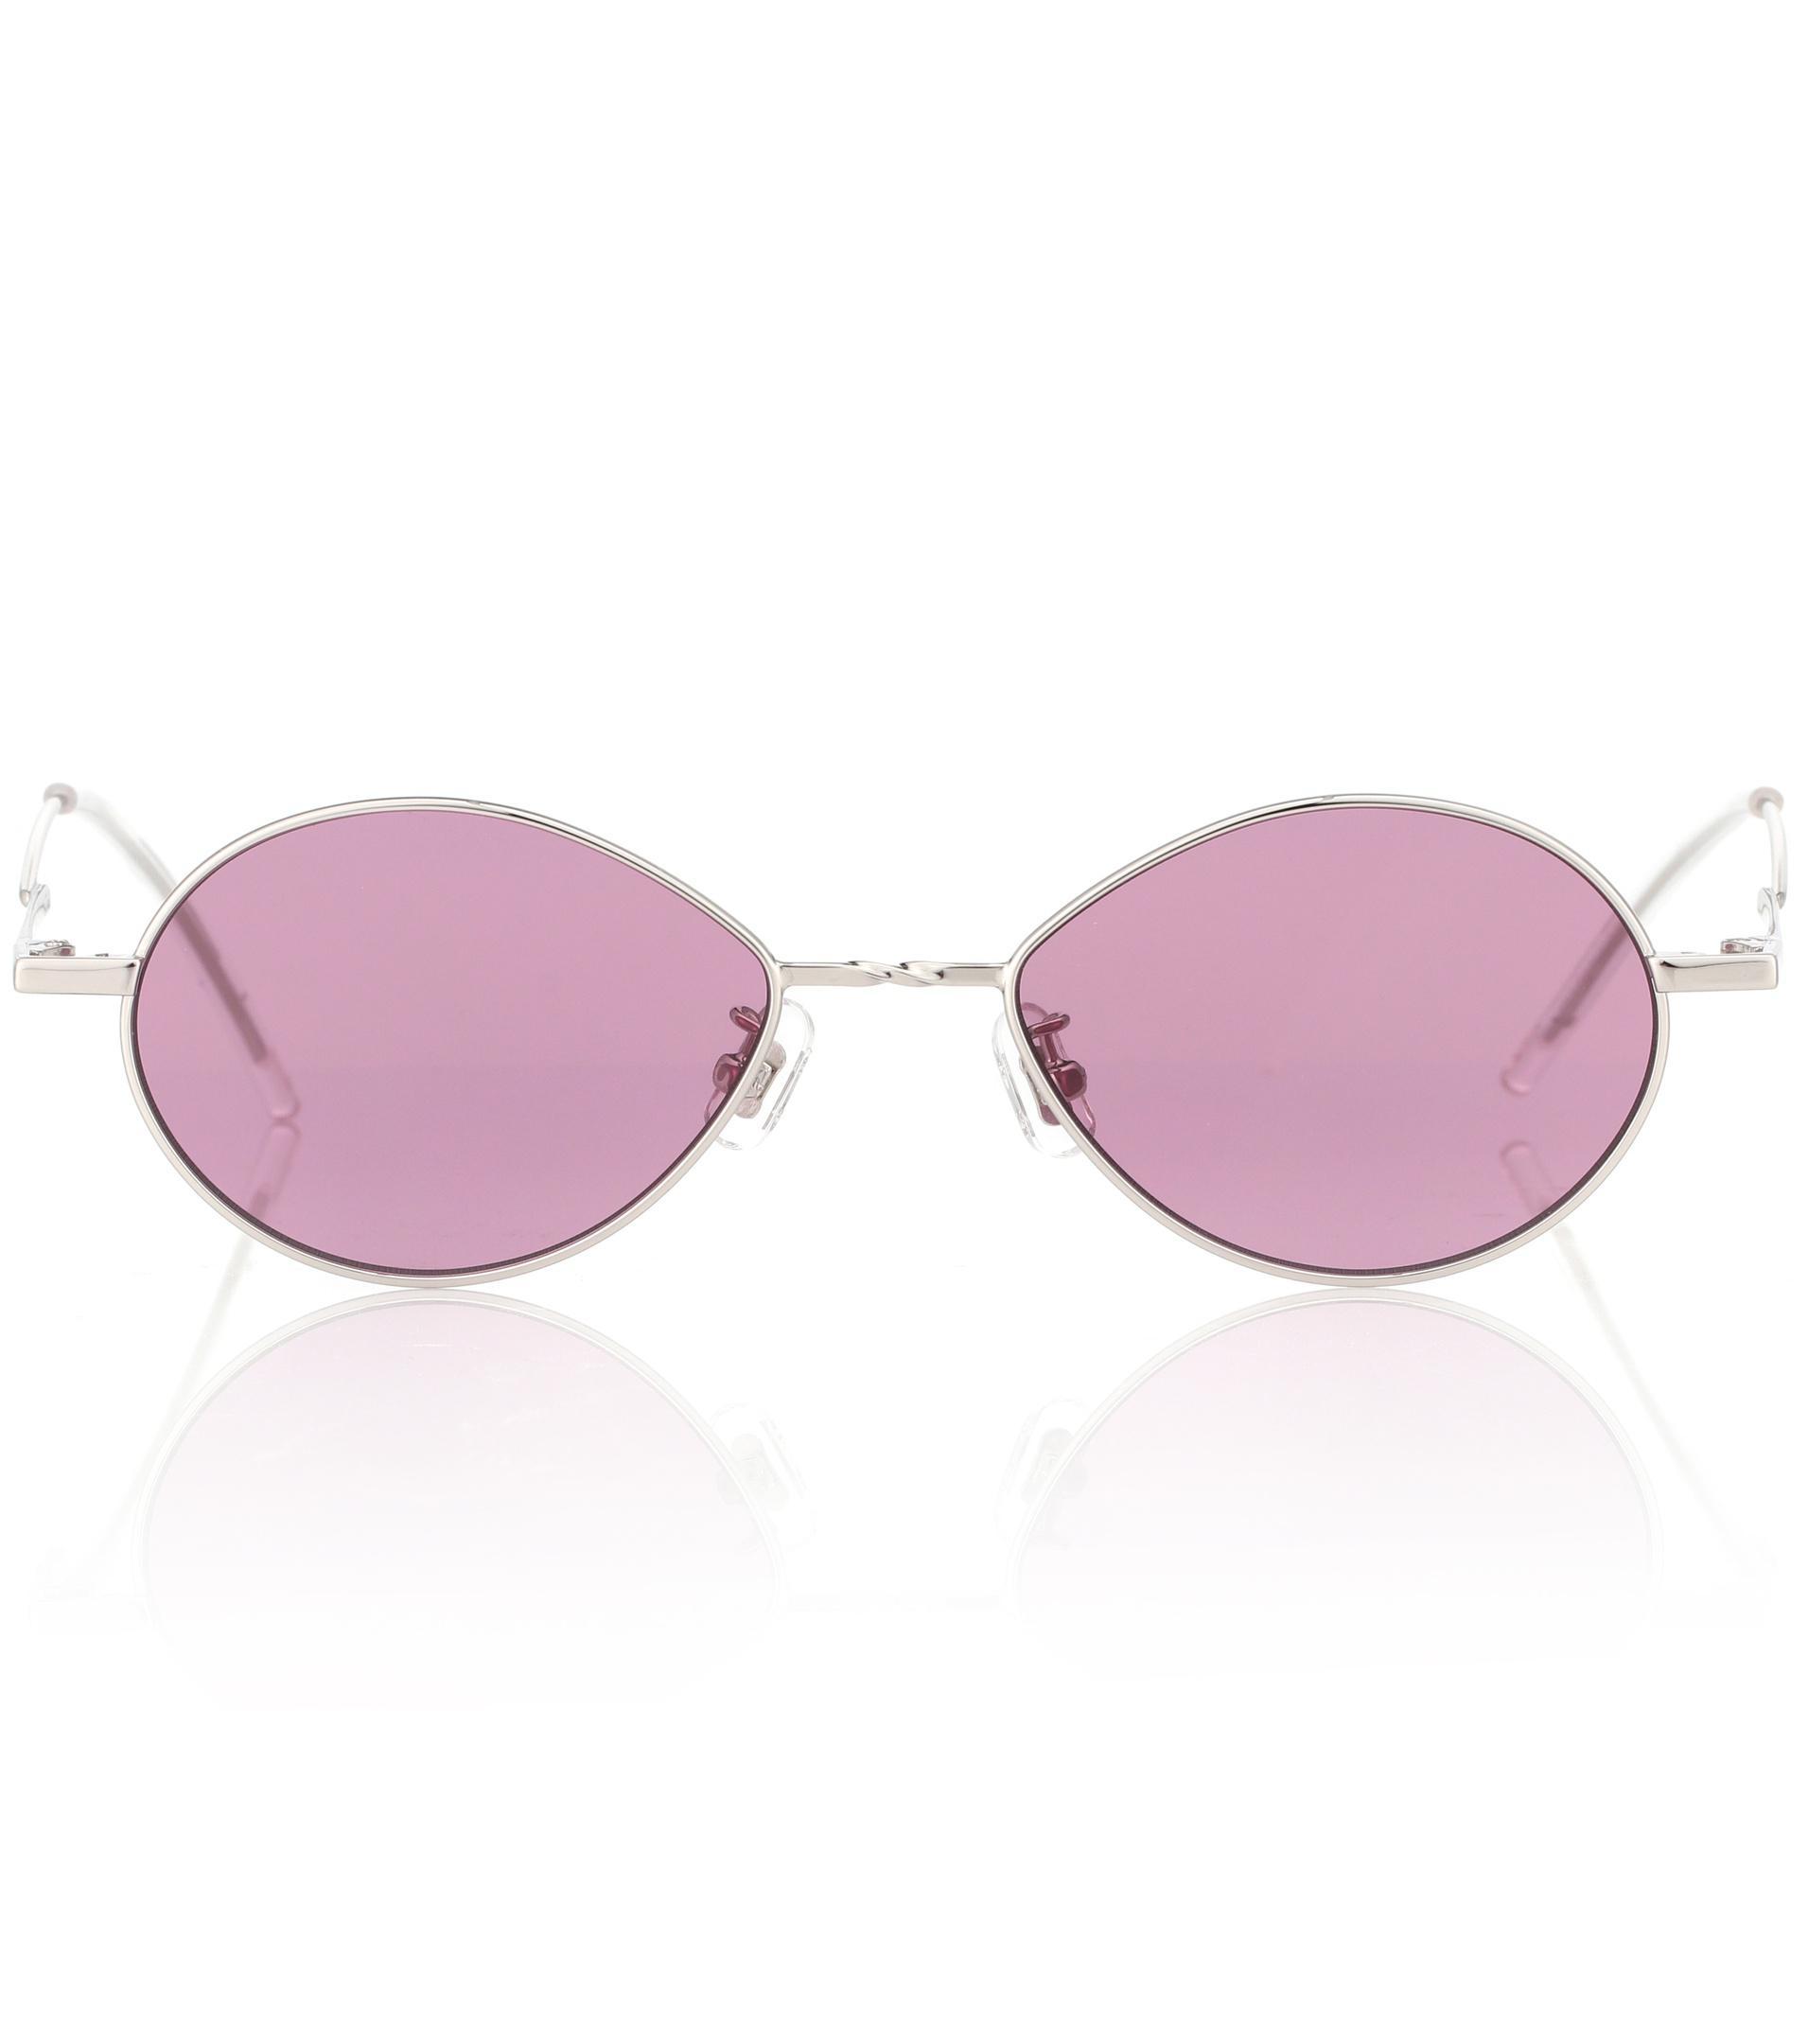 b8babdd15f5e Gentle Monster Cobalt 02 Sunglasses in Purple - Lyst